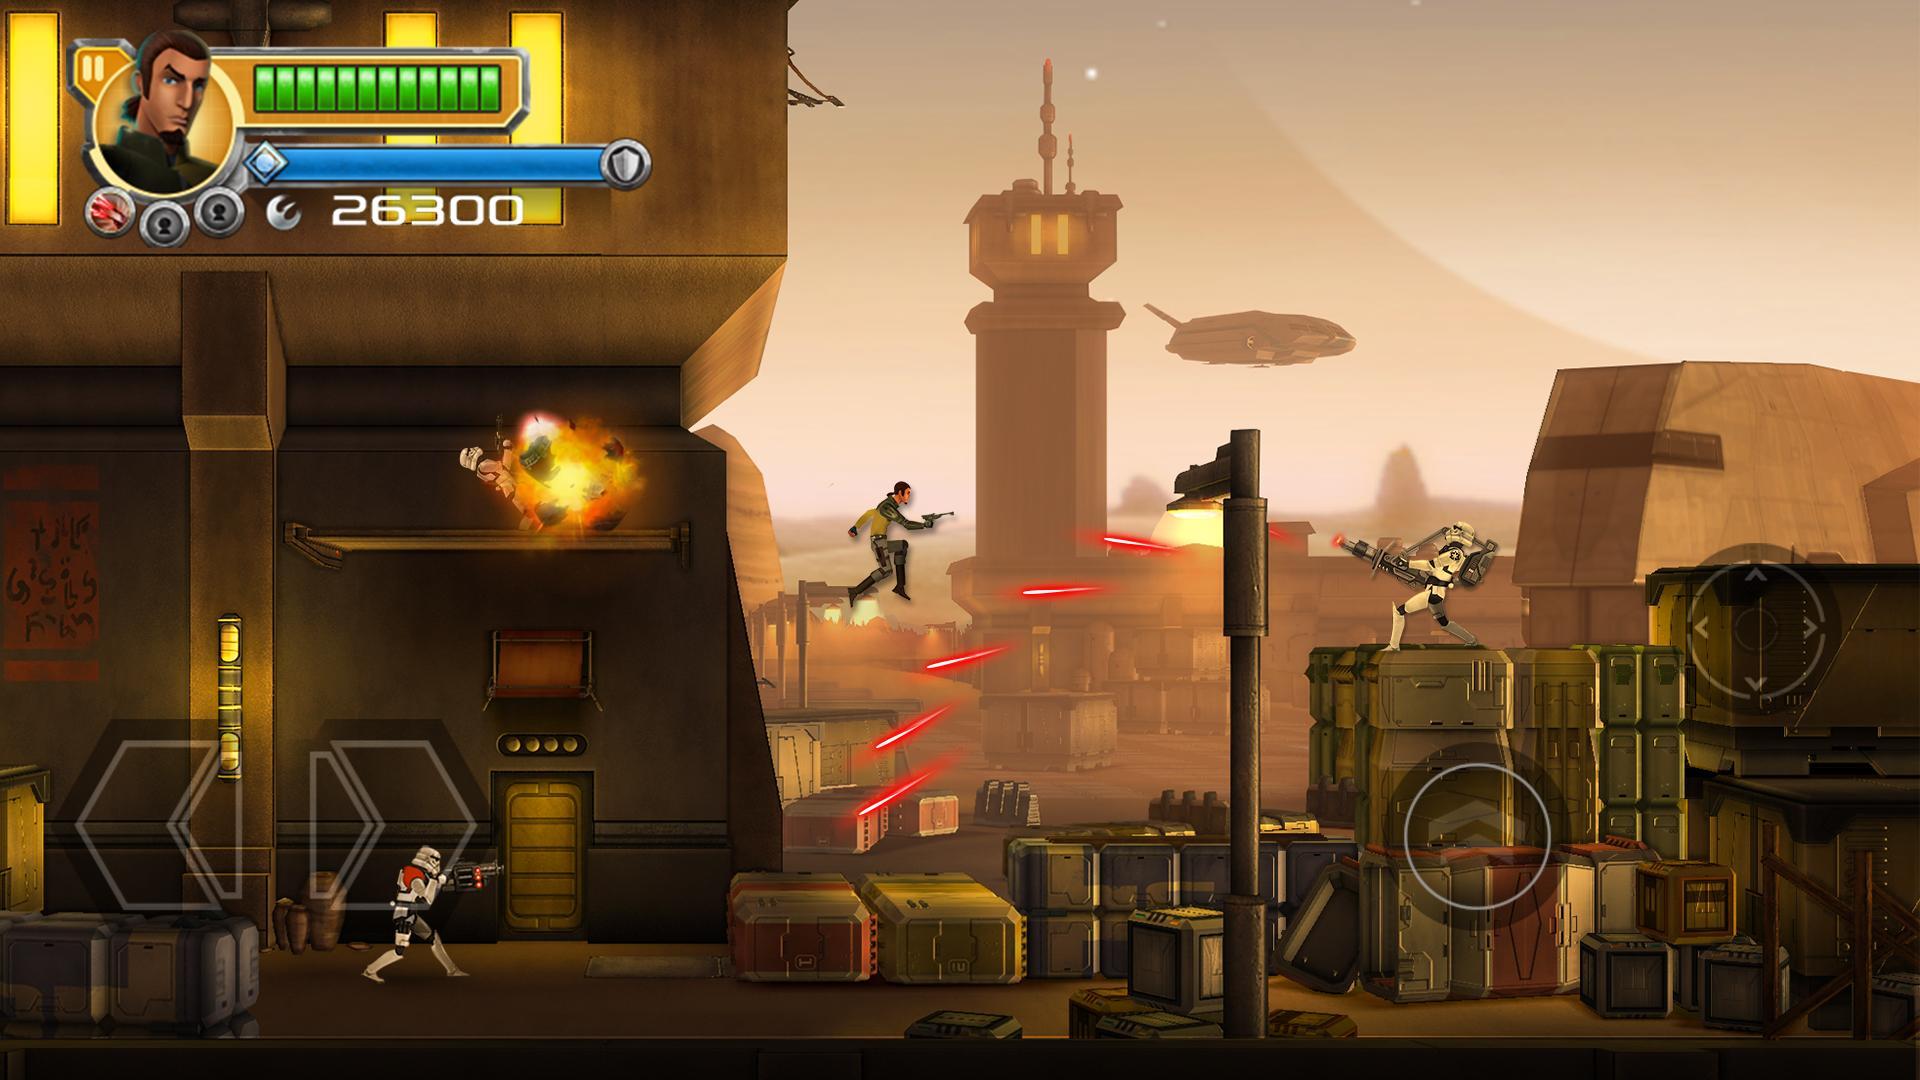 Star Wars Rebels: Missions screenshot #21